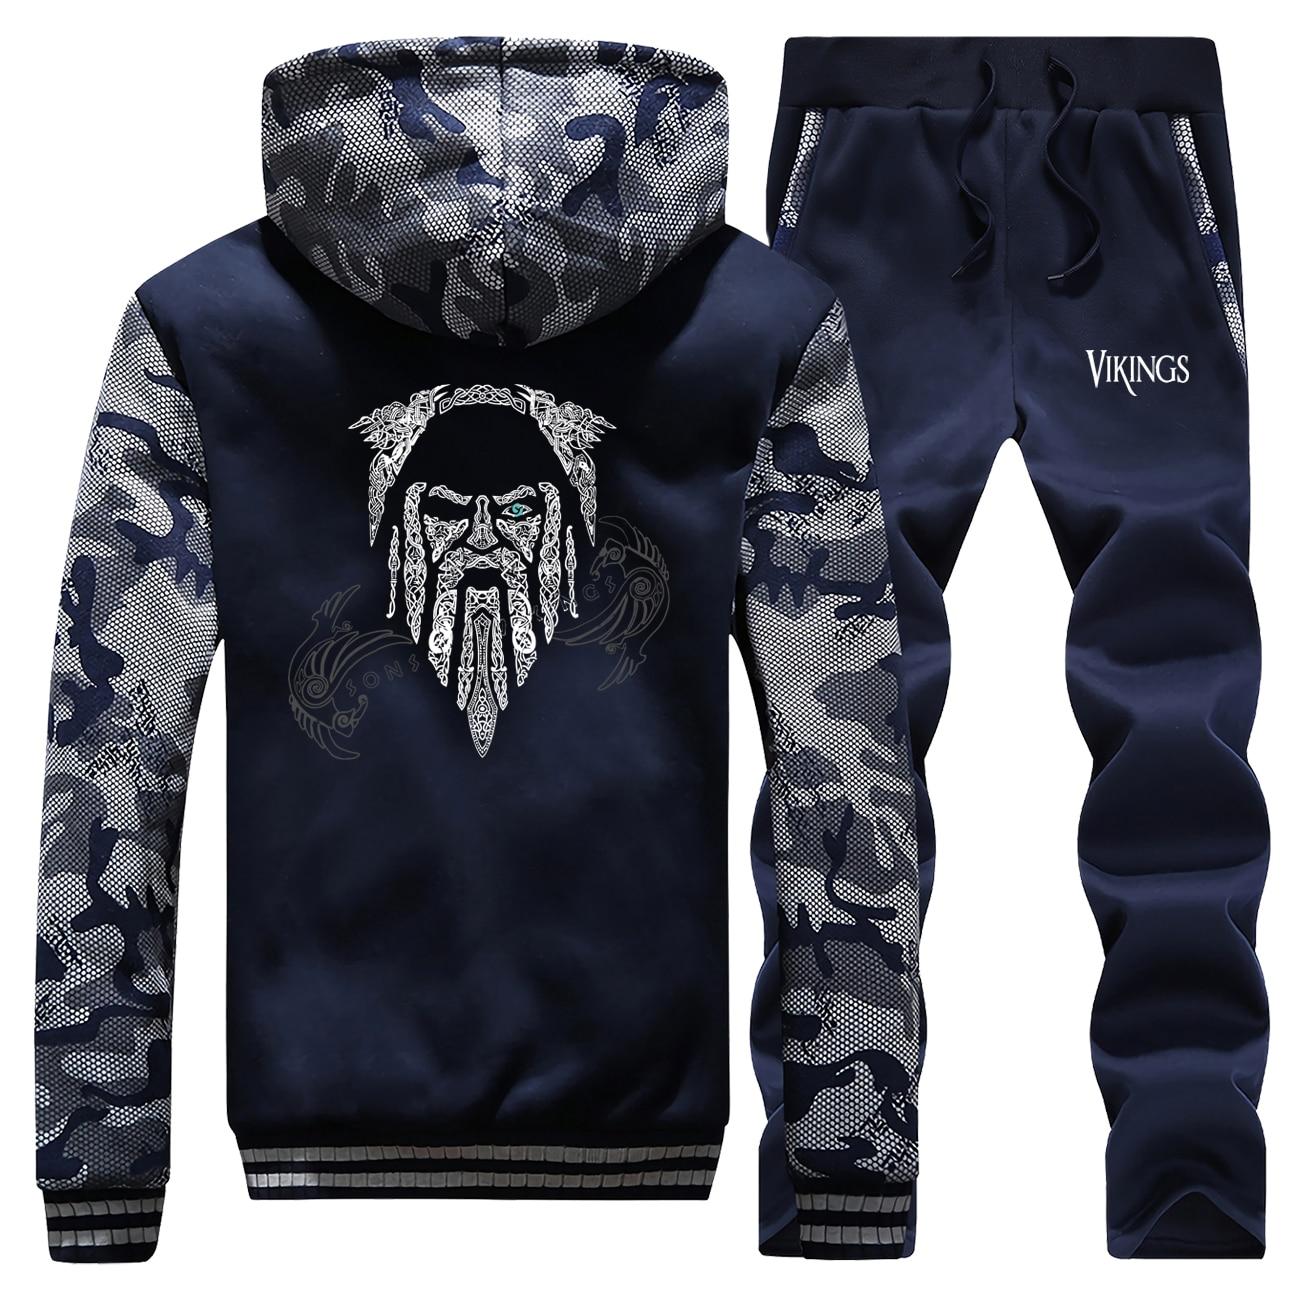 Odin Vikings Hoodies For Men Fashion Tracksuit Mens Sweatshirt Hoodie+Pants 2 Piece Sets Thick Zip Jacket Men's Winter Warm Suit